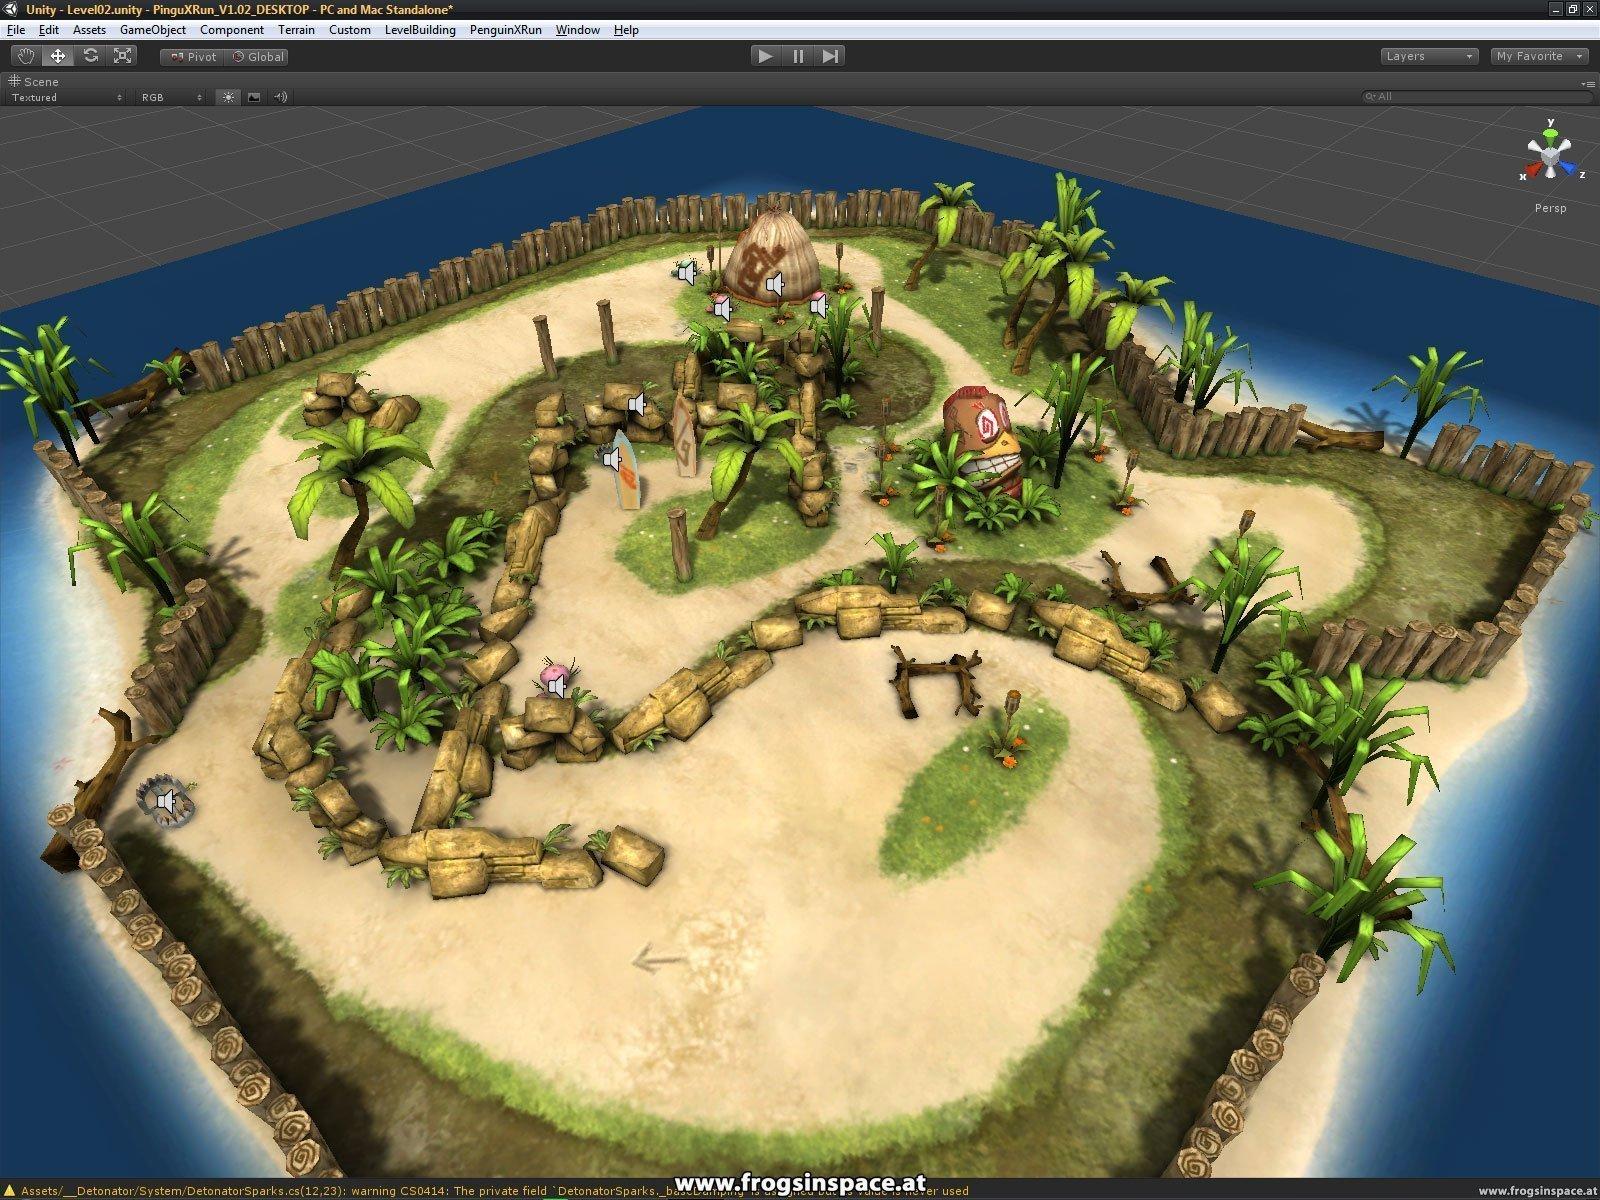 Unity Editor: Level display